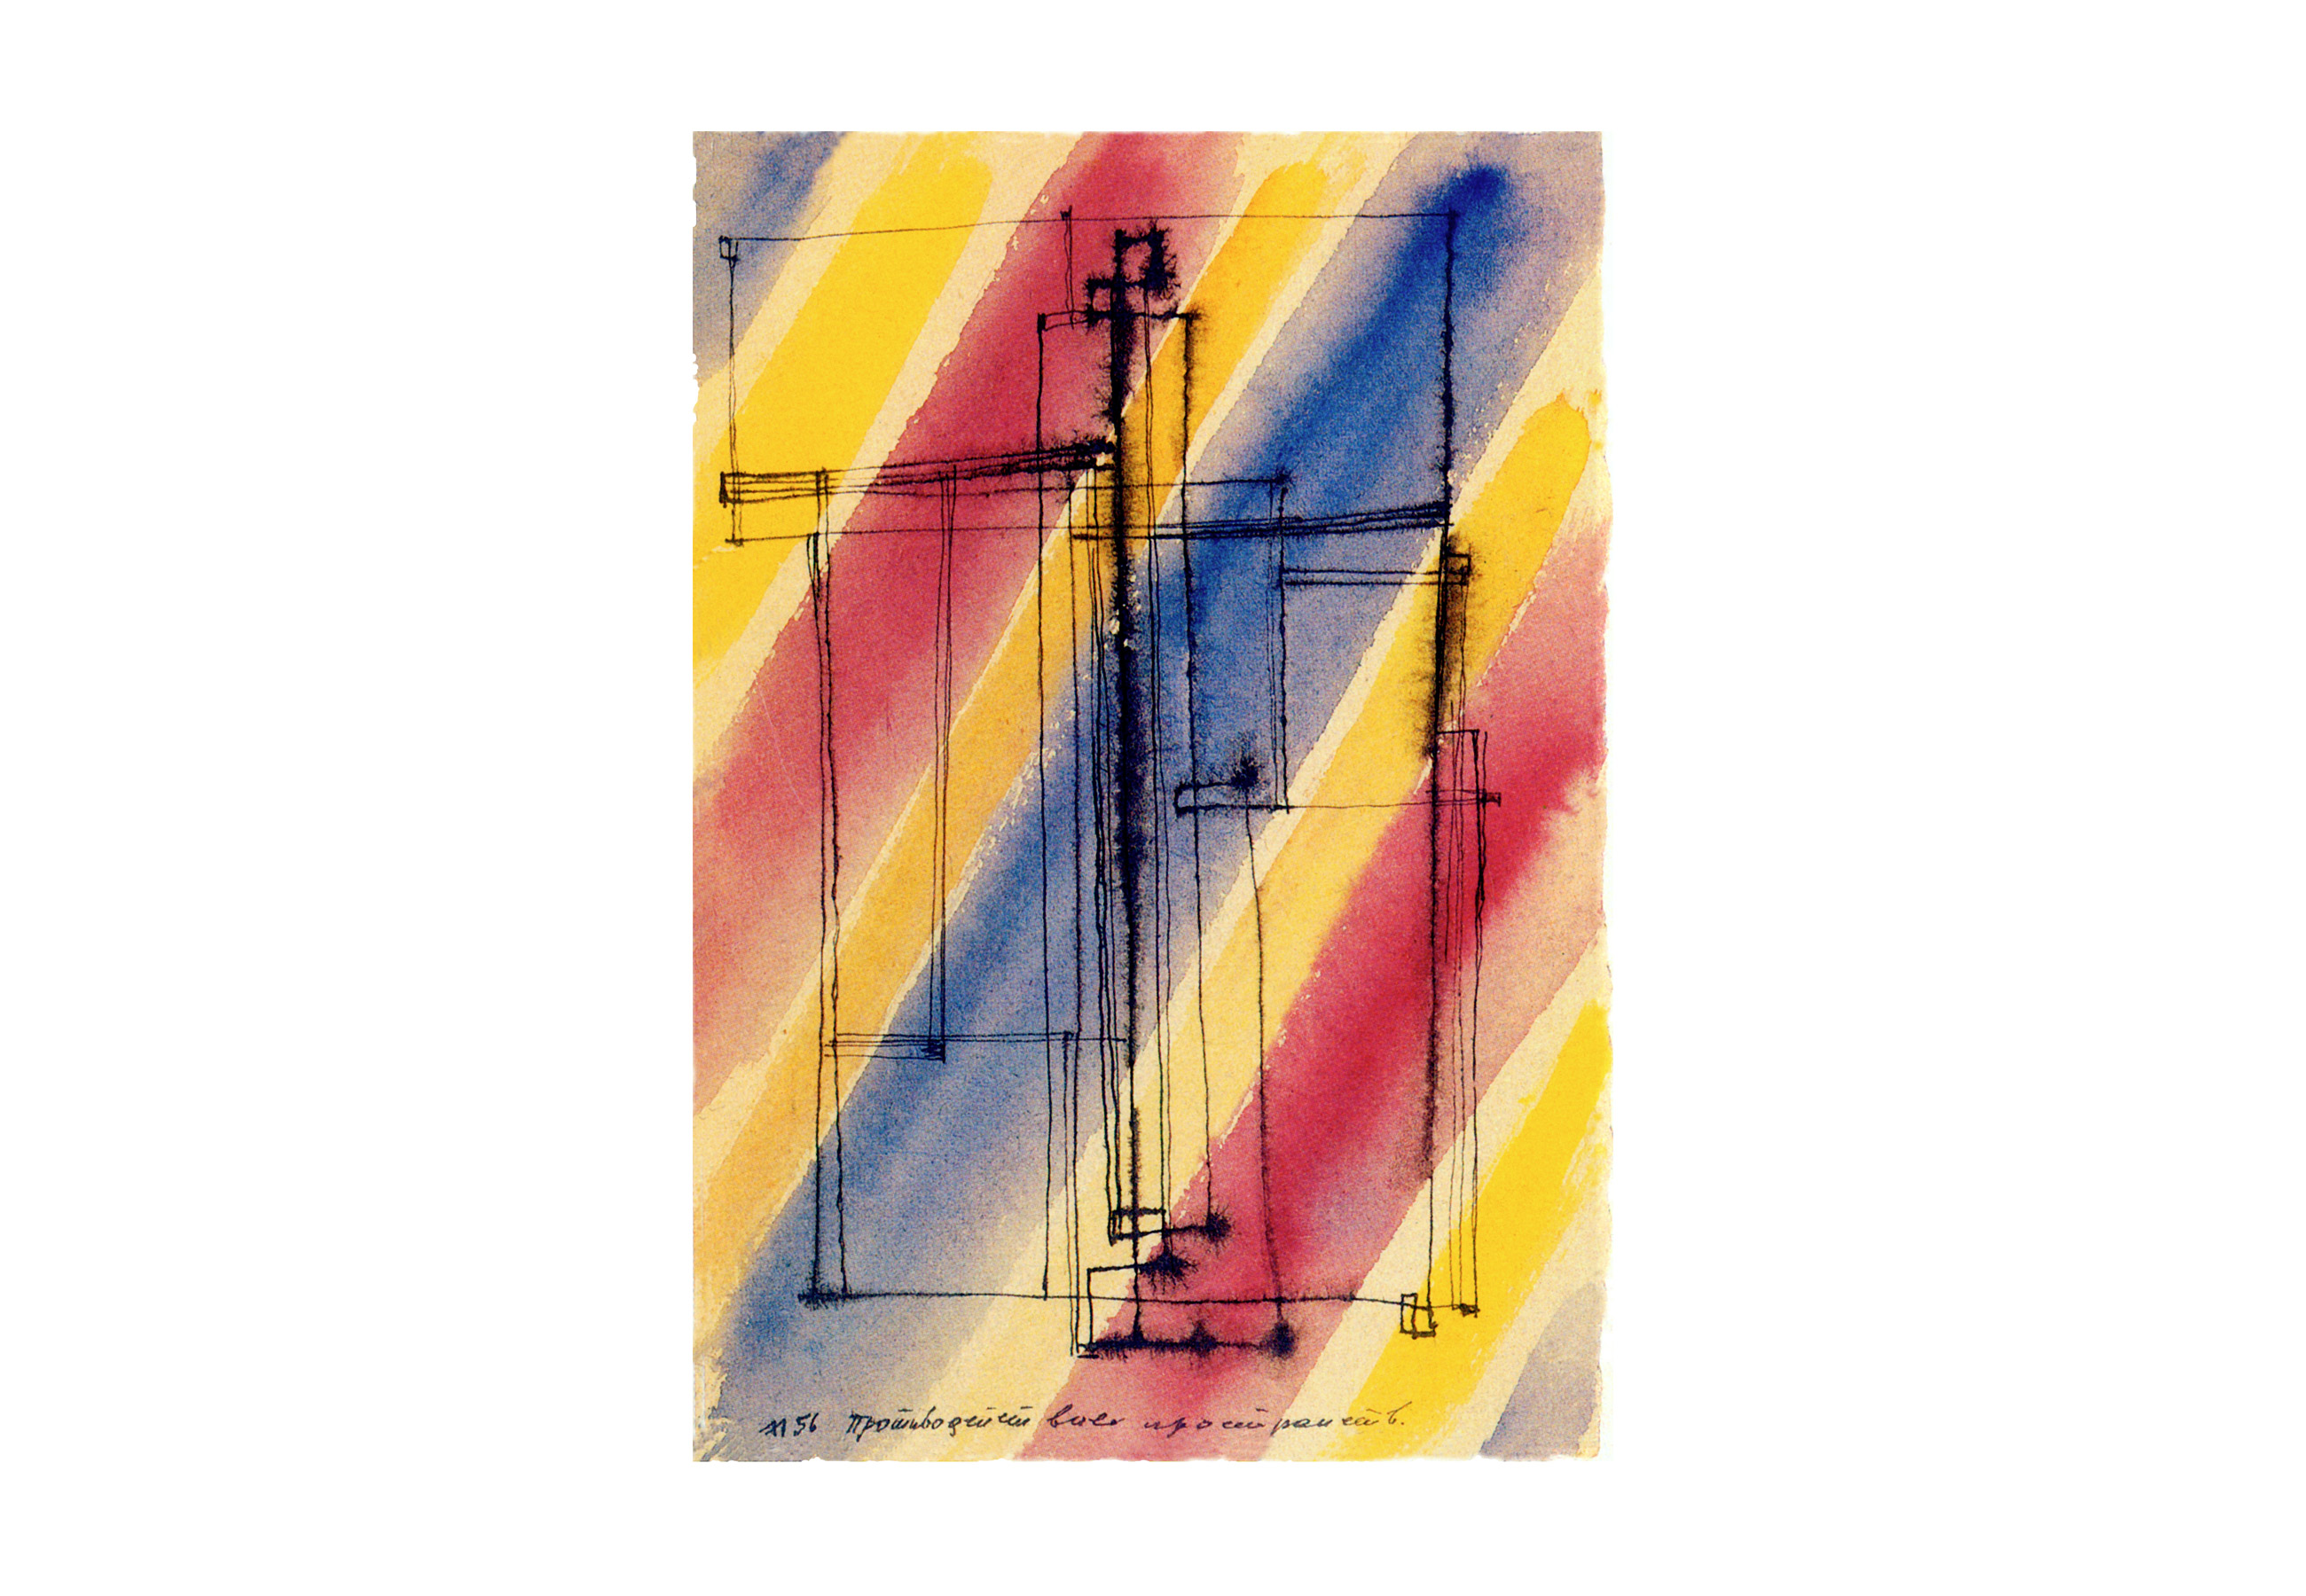 Lamm-Portfolio-1956-59-3.jpg